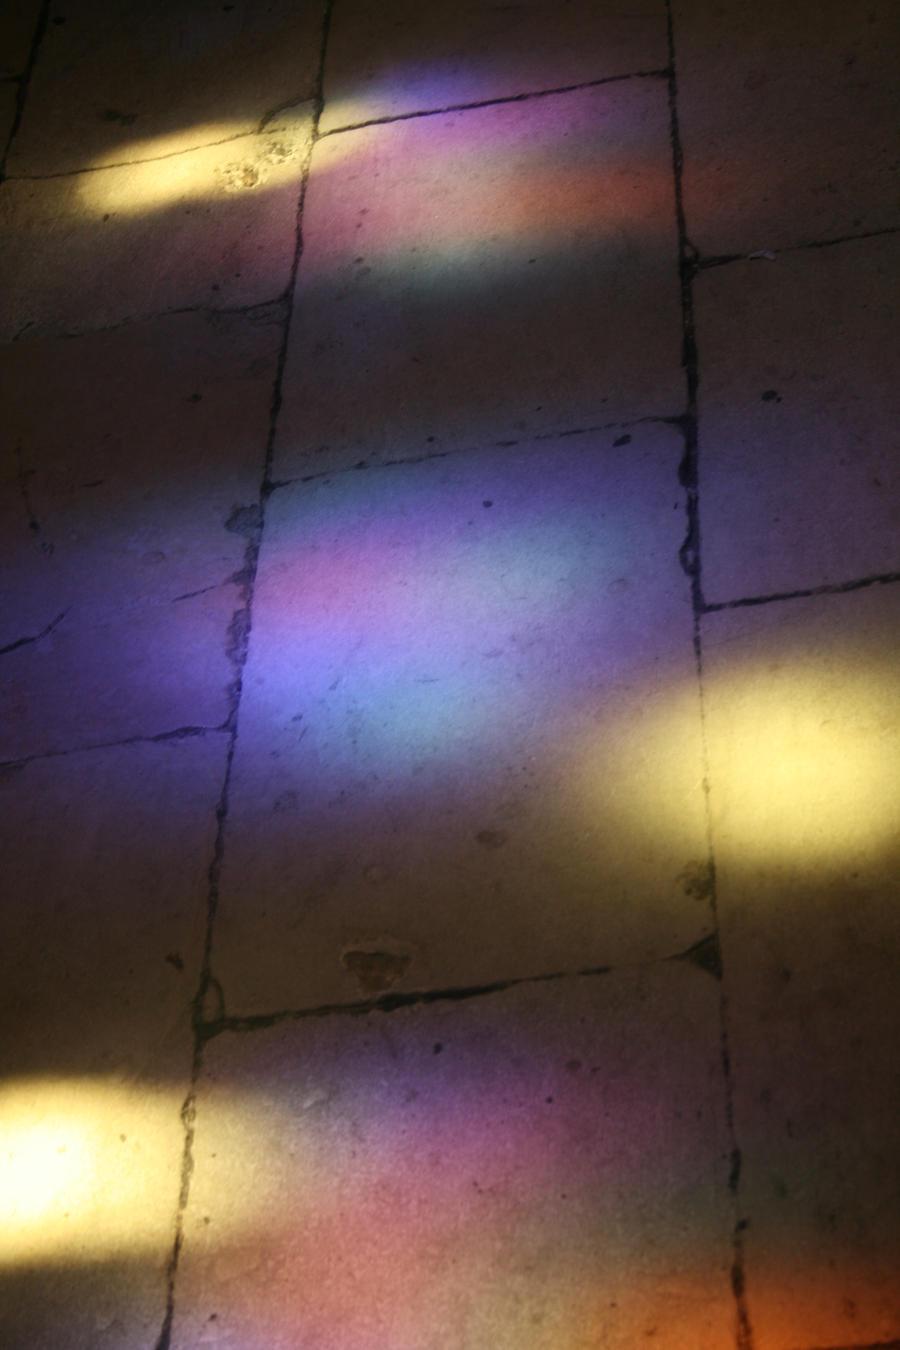 Into The Lights Texture by RaeyenIrael-Stock